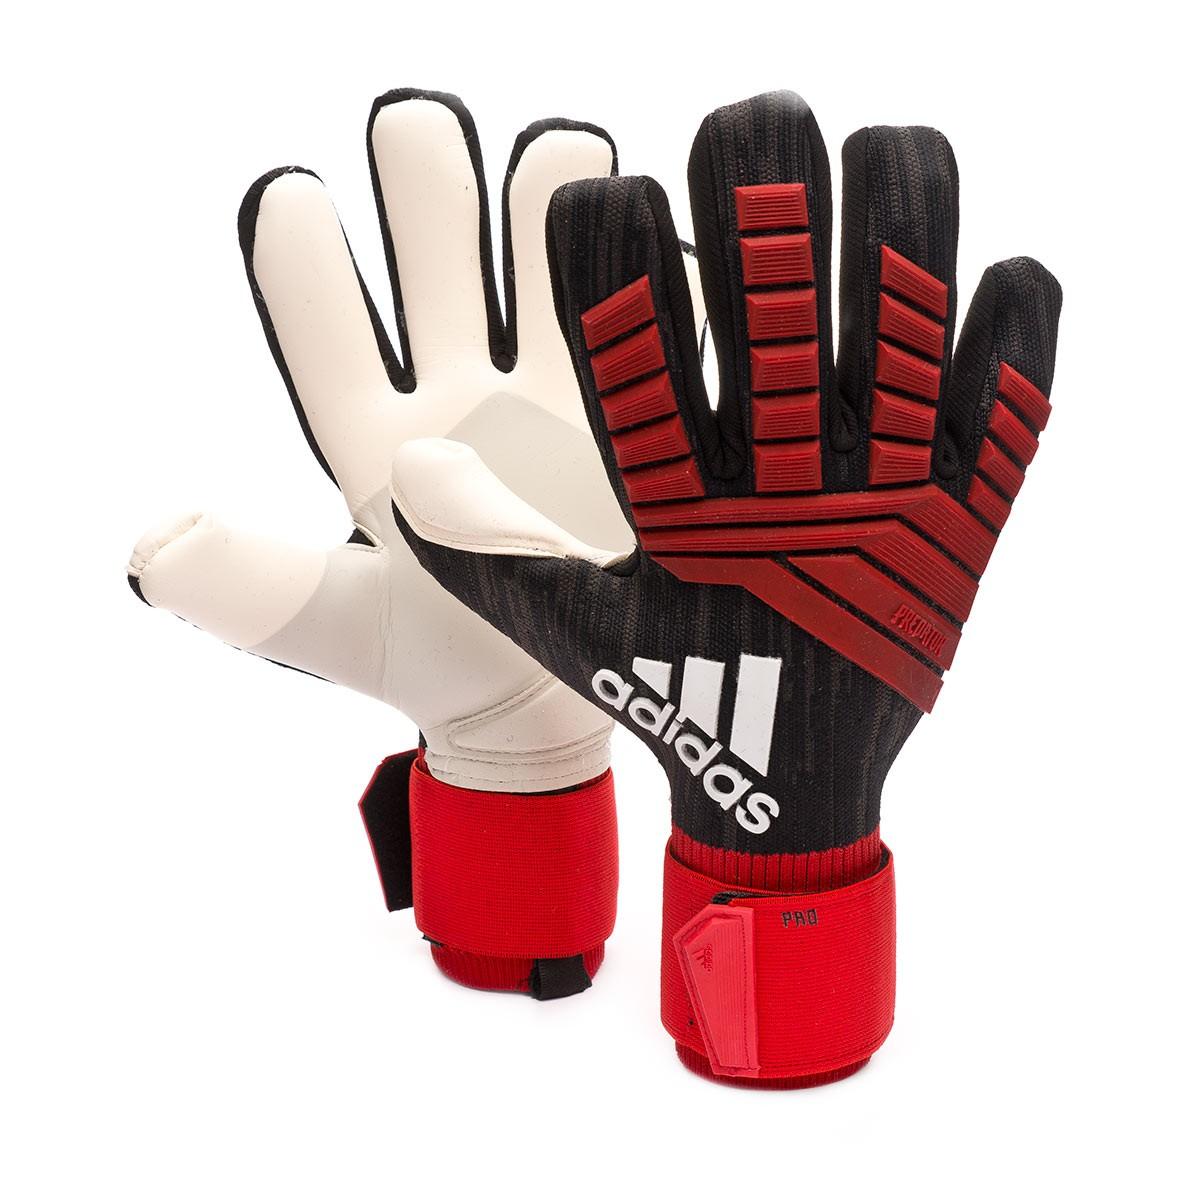 padre Arashigaoka Acompañar  Guante de portero adidas Predator Pro Black-Red-White - Tienda de fútbol  Fútbol Emotion